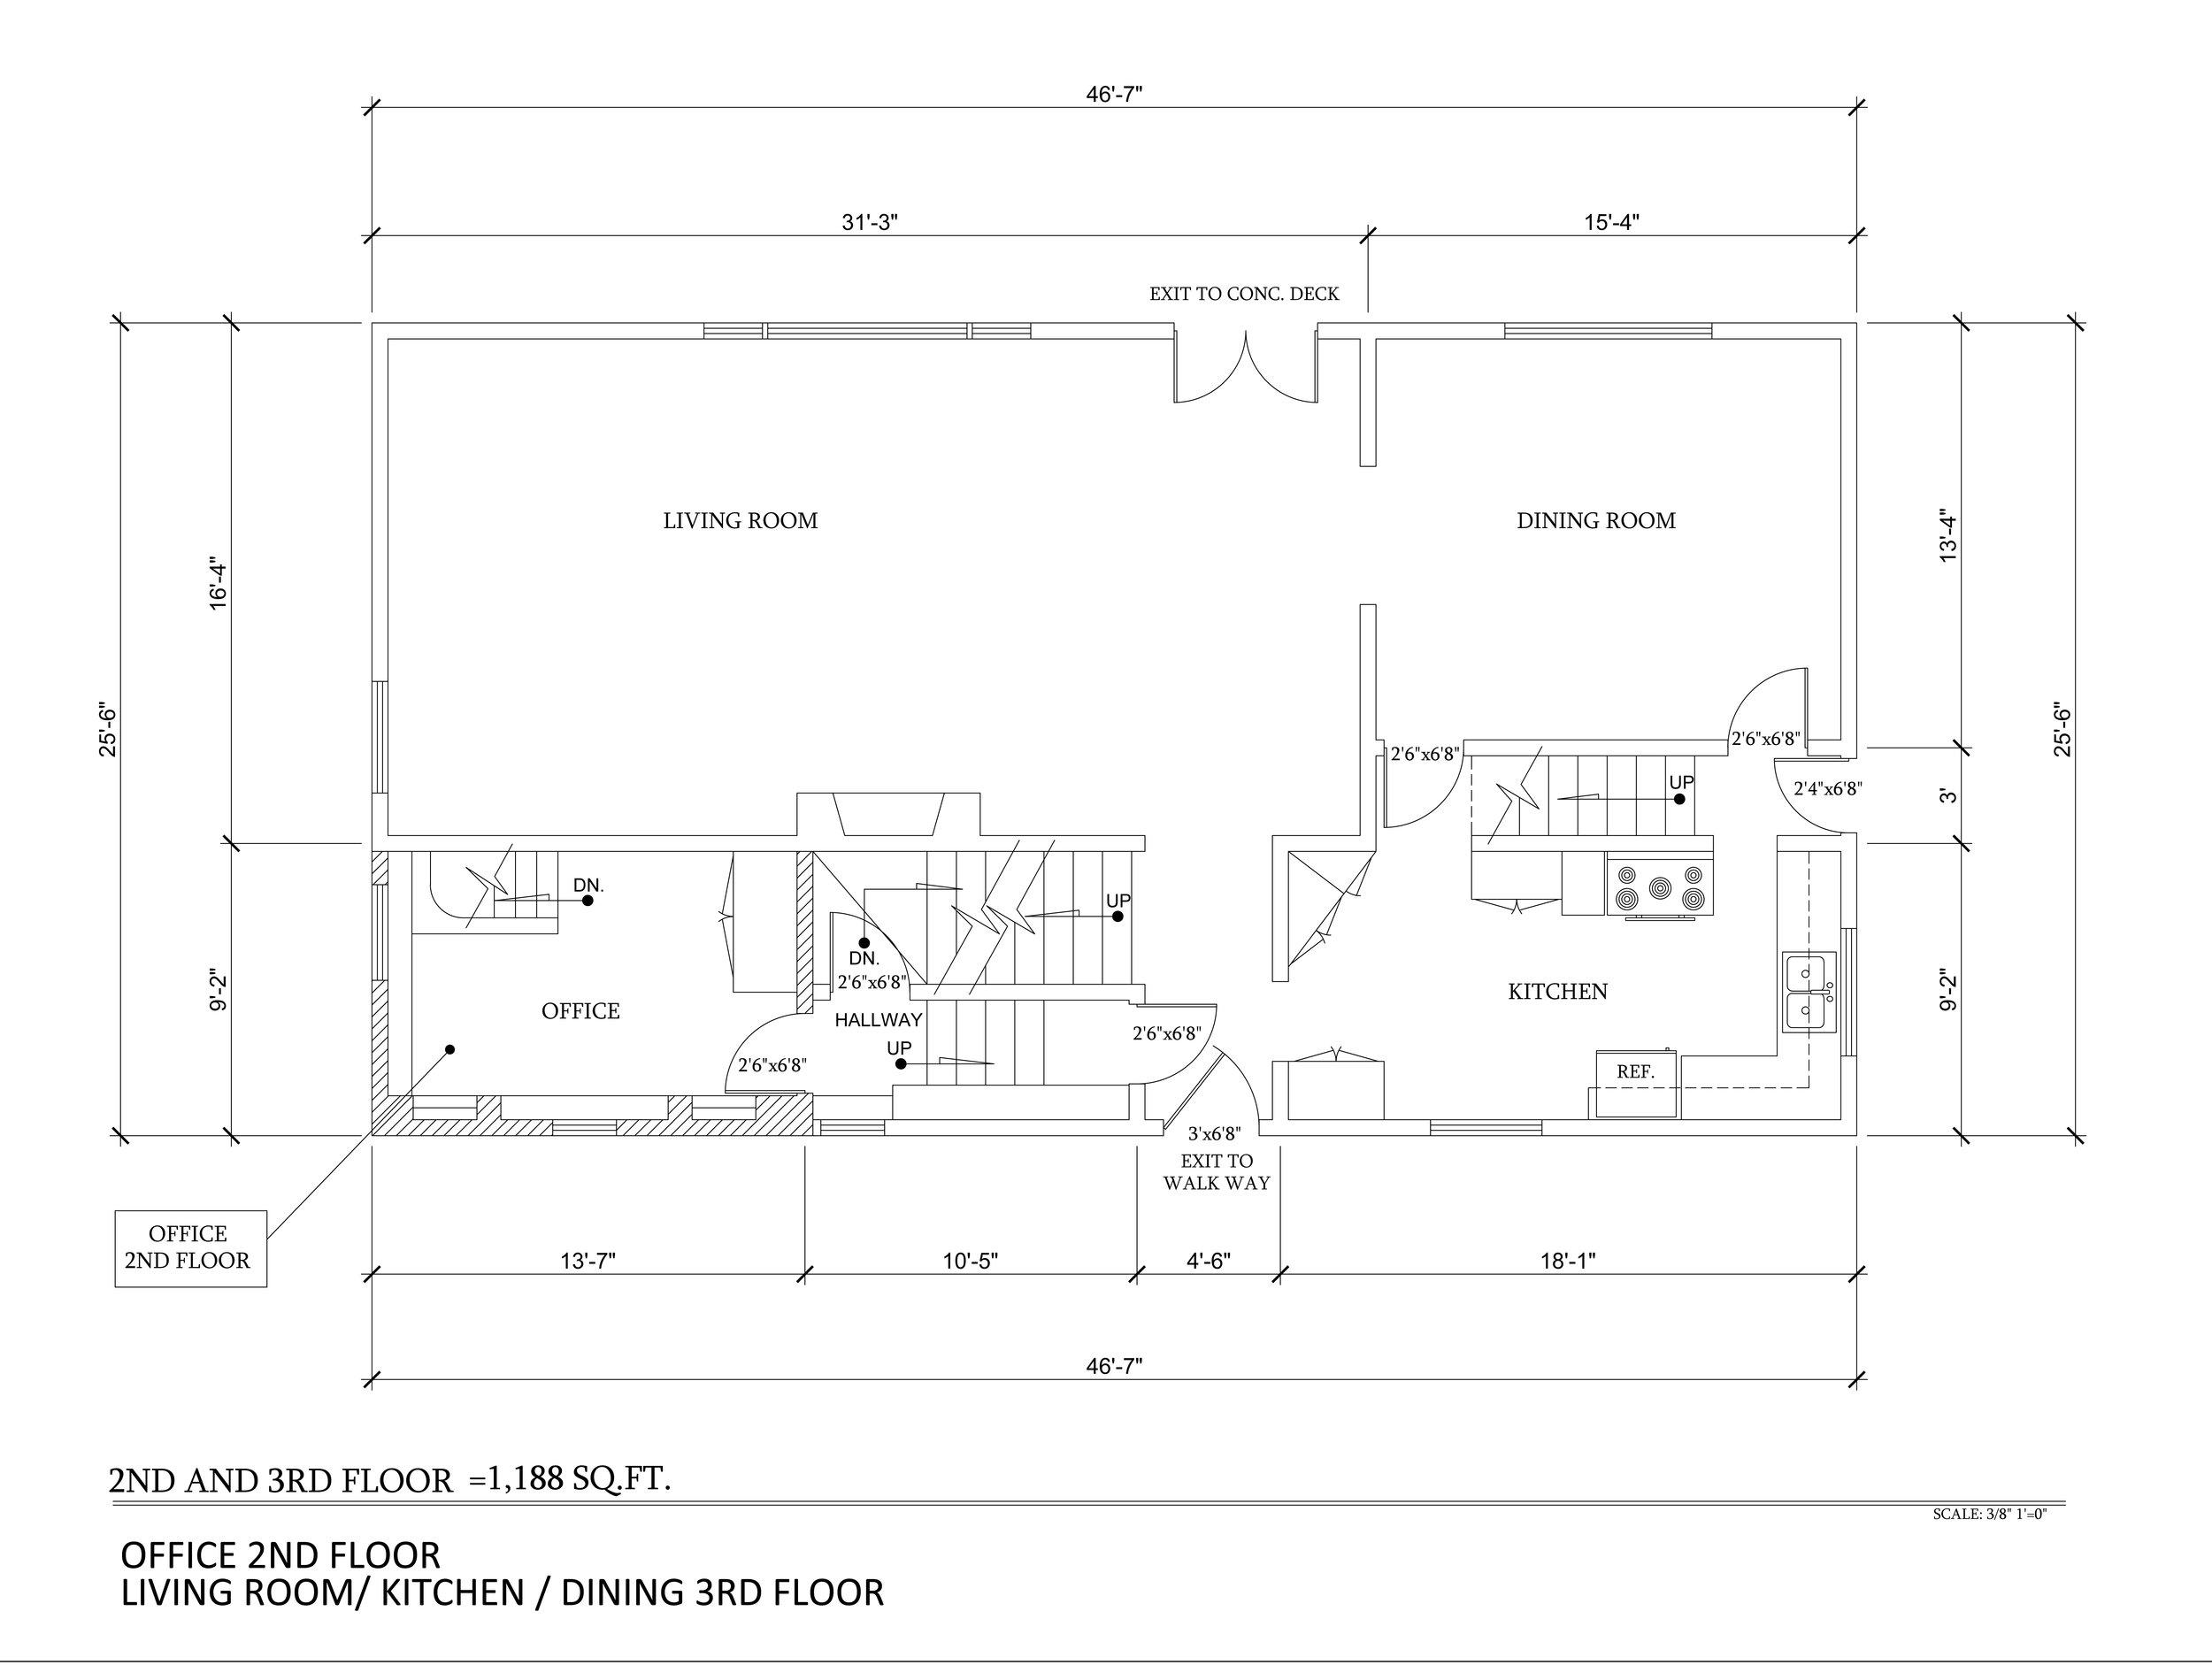 As Built 2nd & 3rd Floor 3355 N copy.Knoll Dr 3-15-15.jpg